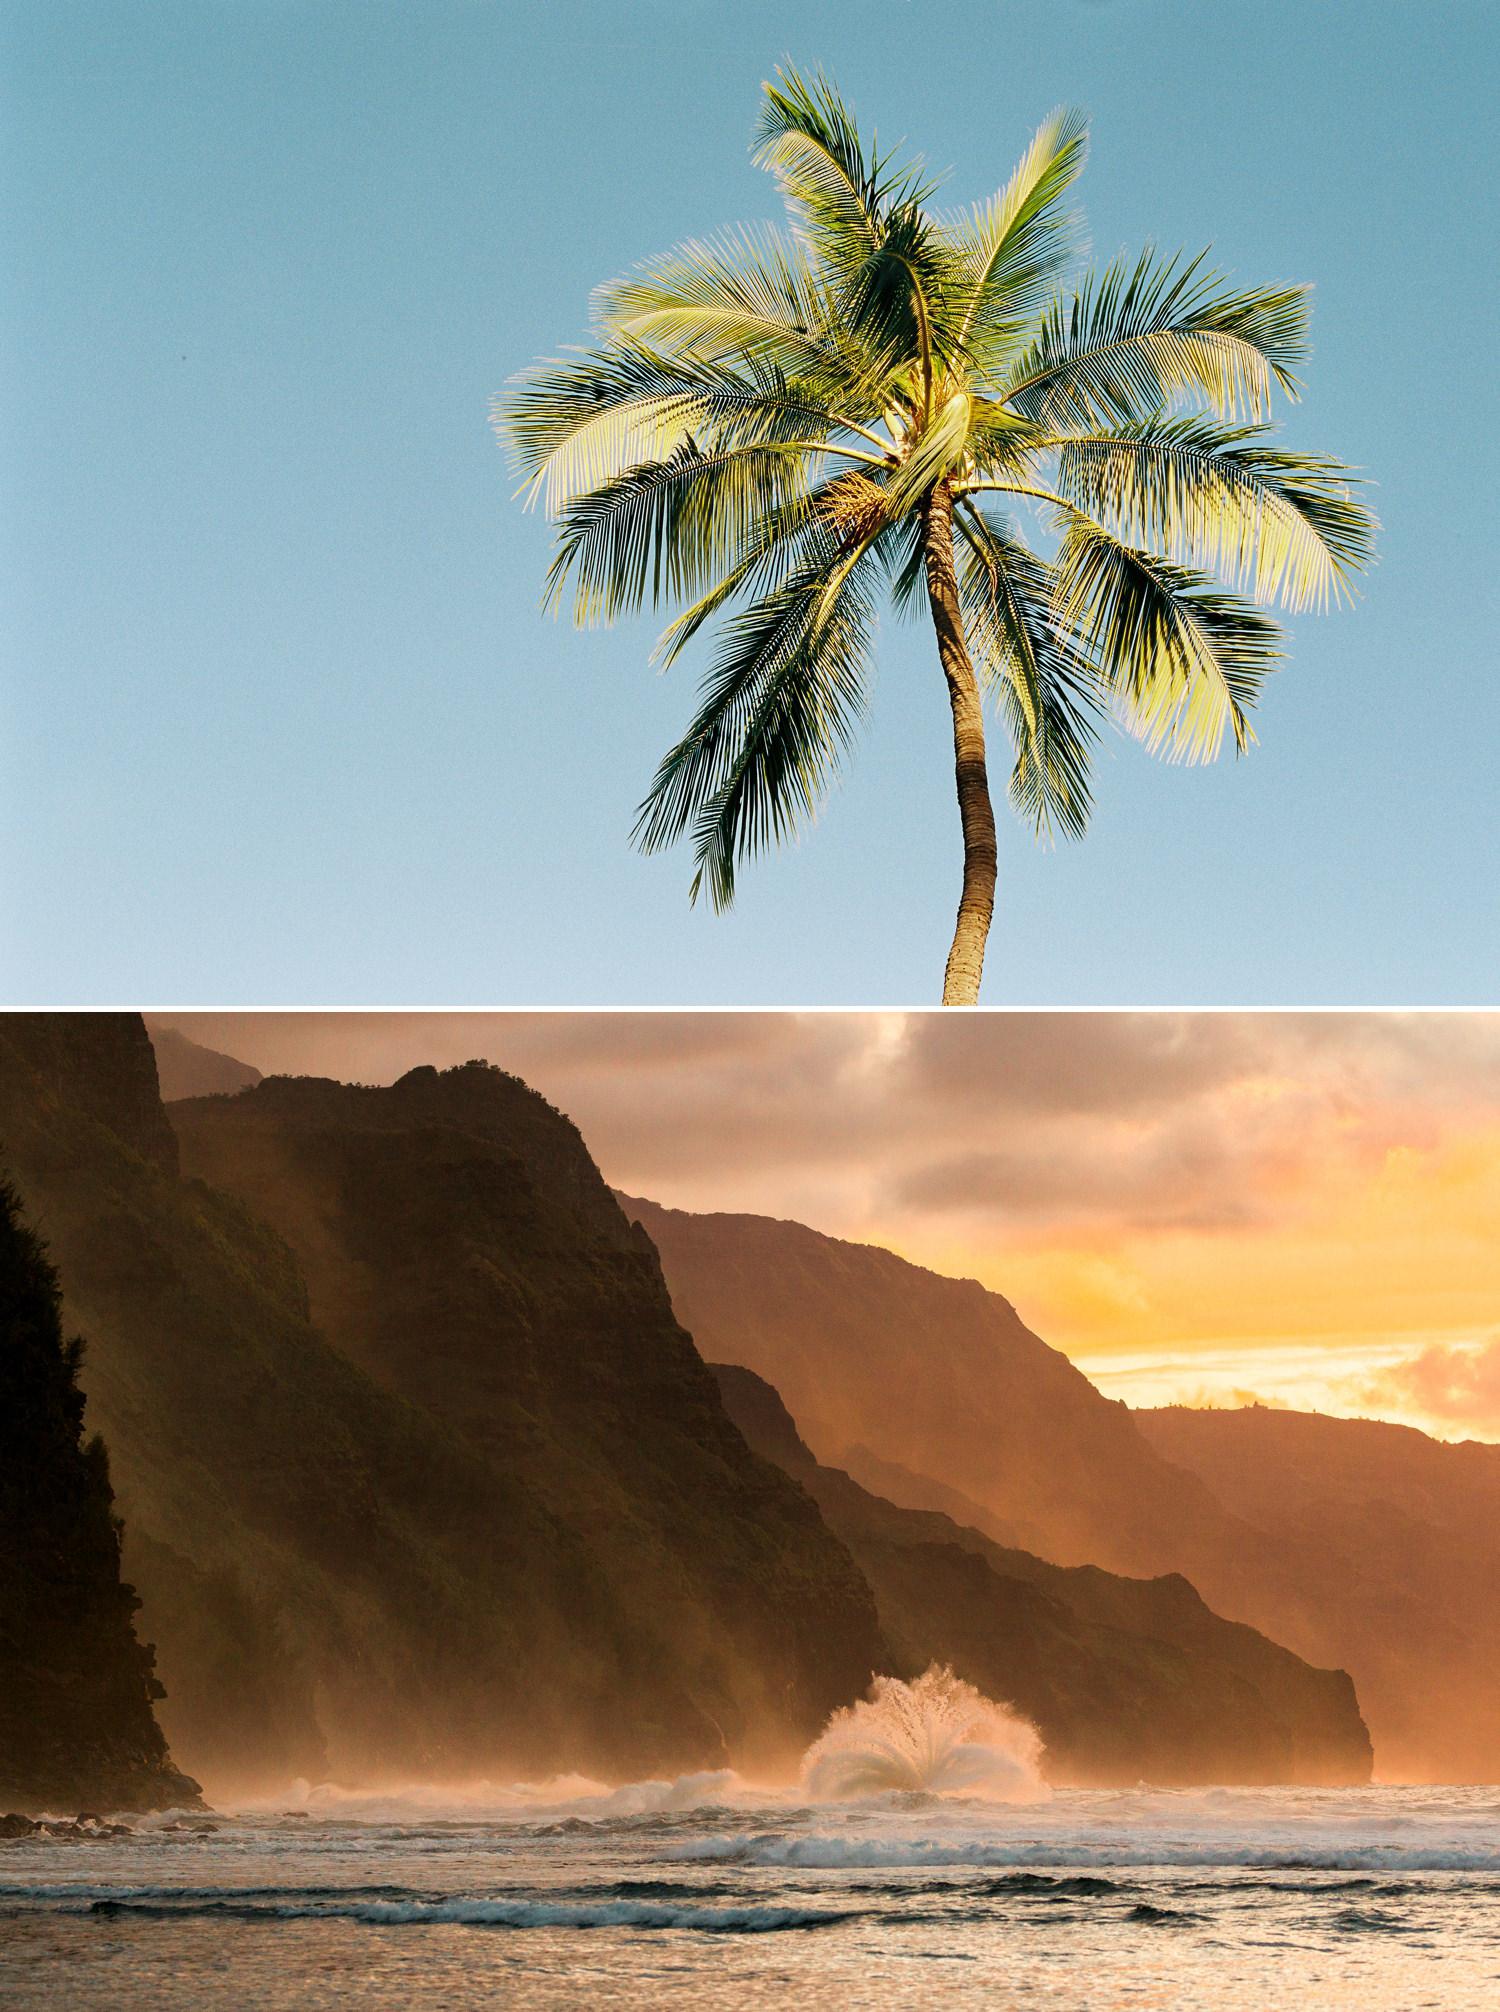 cameron-zegers-photography-travel-hawaii-kauai-1.jpg